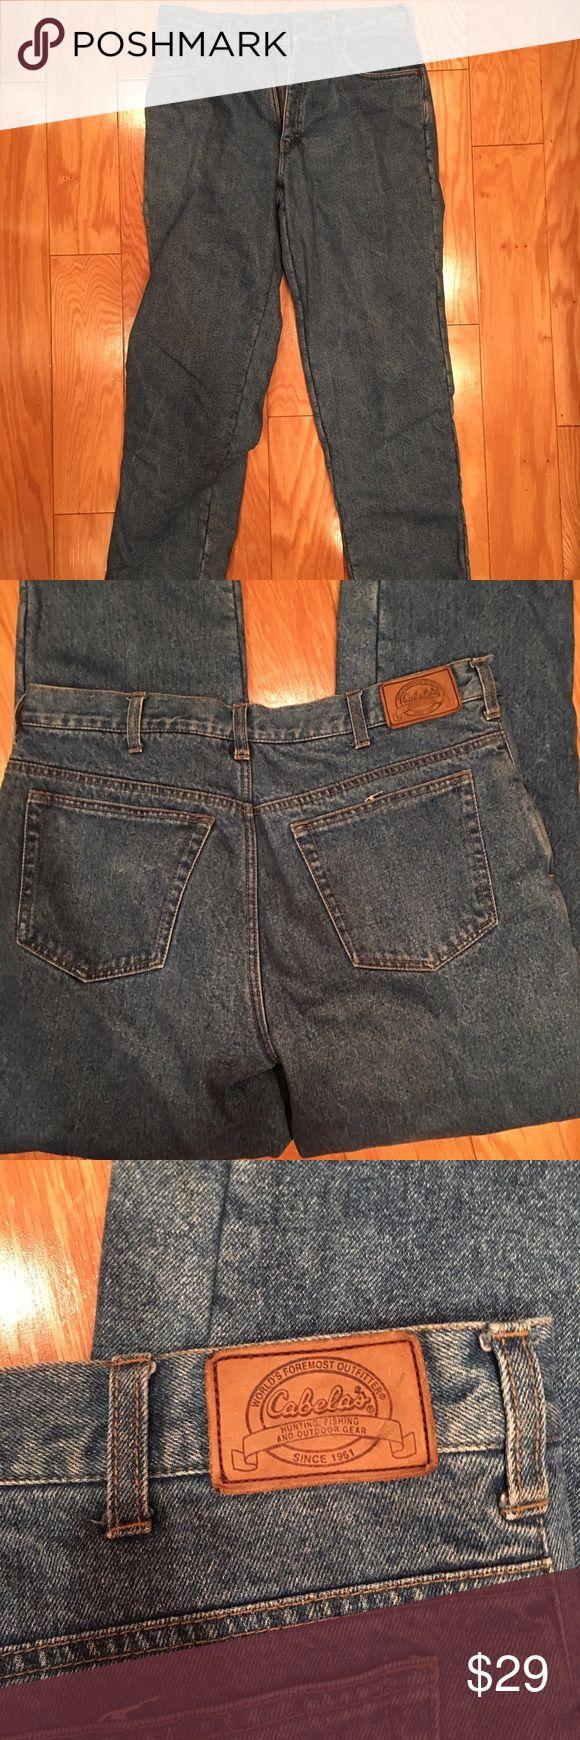 Men's Flannel lined jeans NWOT Cabelas flannel lined jeans.  Size 34R Cabelas Jeans Relaxed